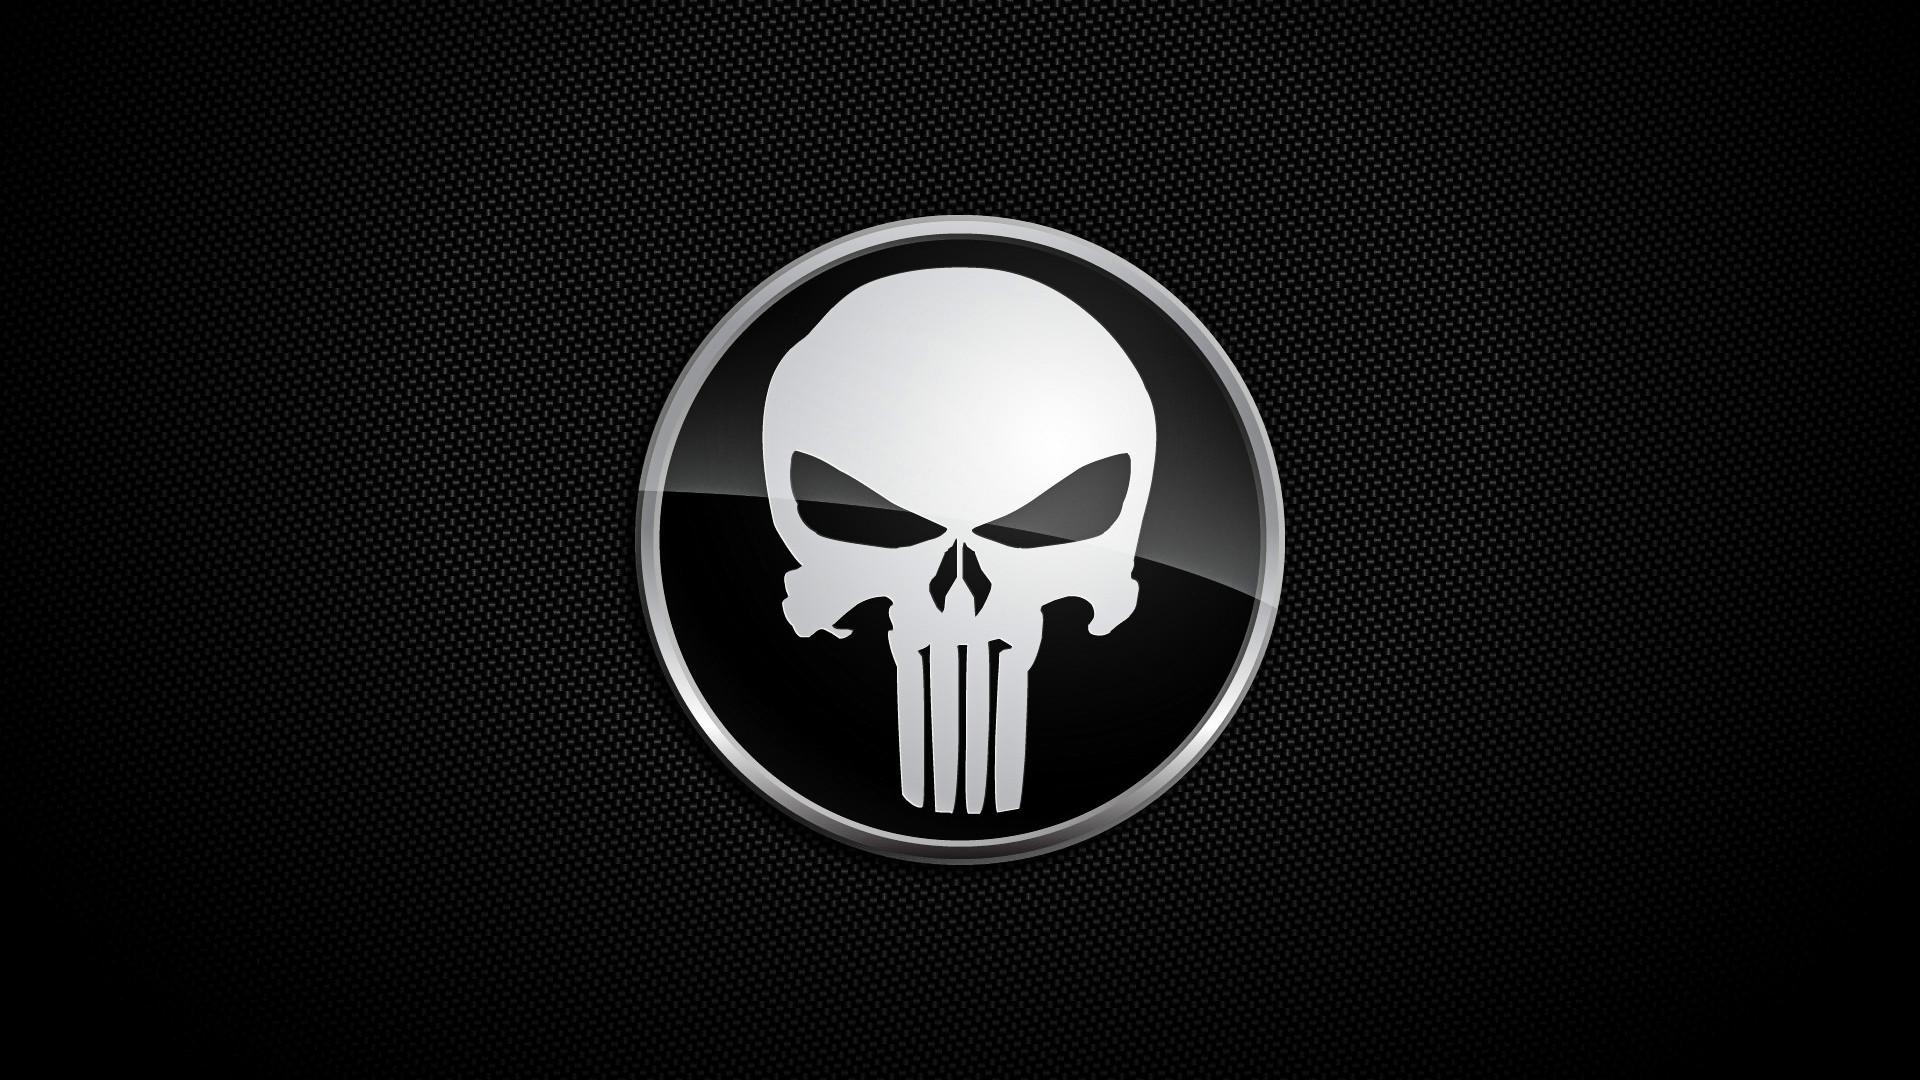 Full HD 1080p Skull Wallpapers HD, Desktop Backgrounds .